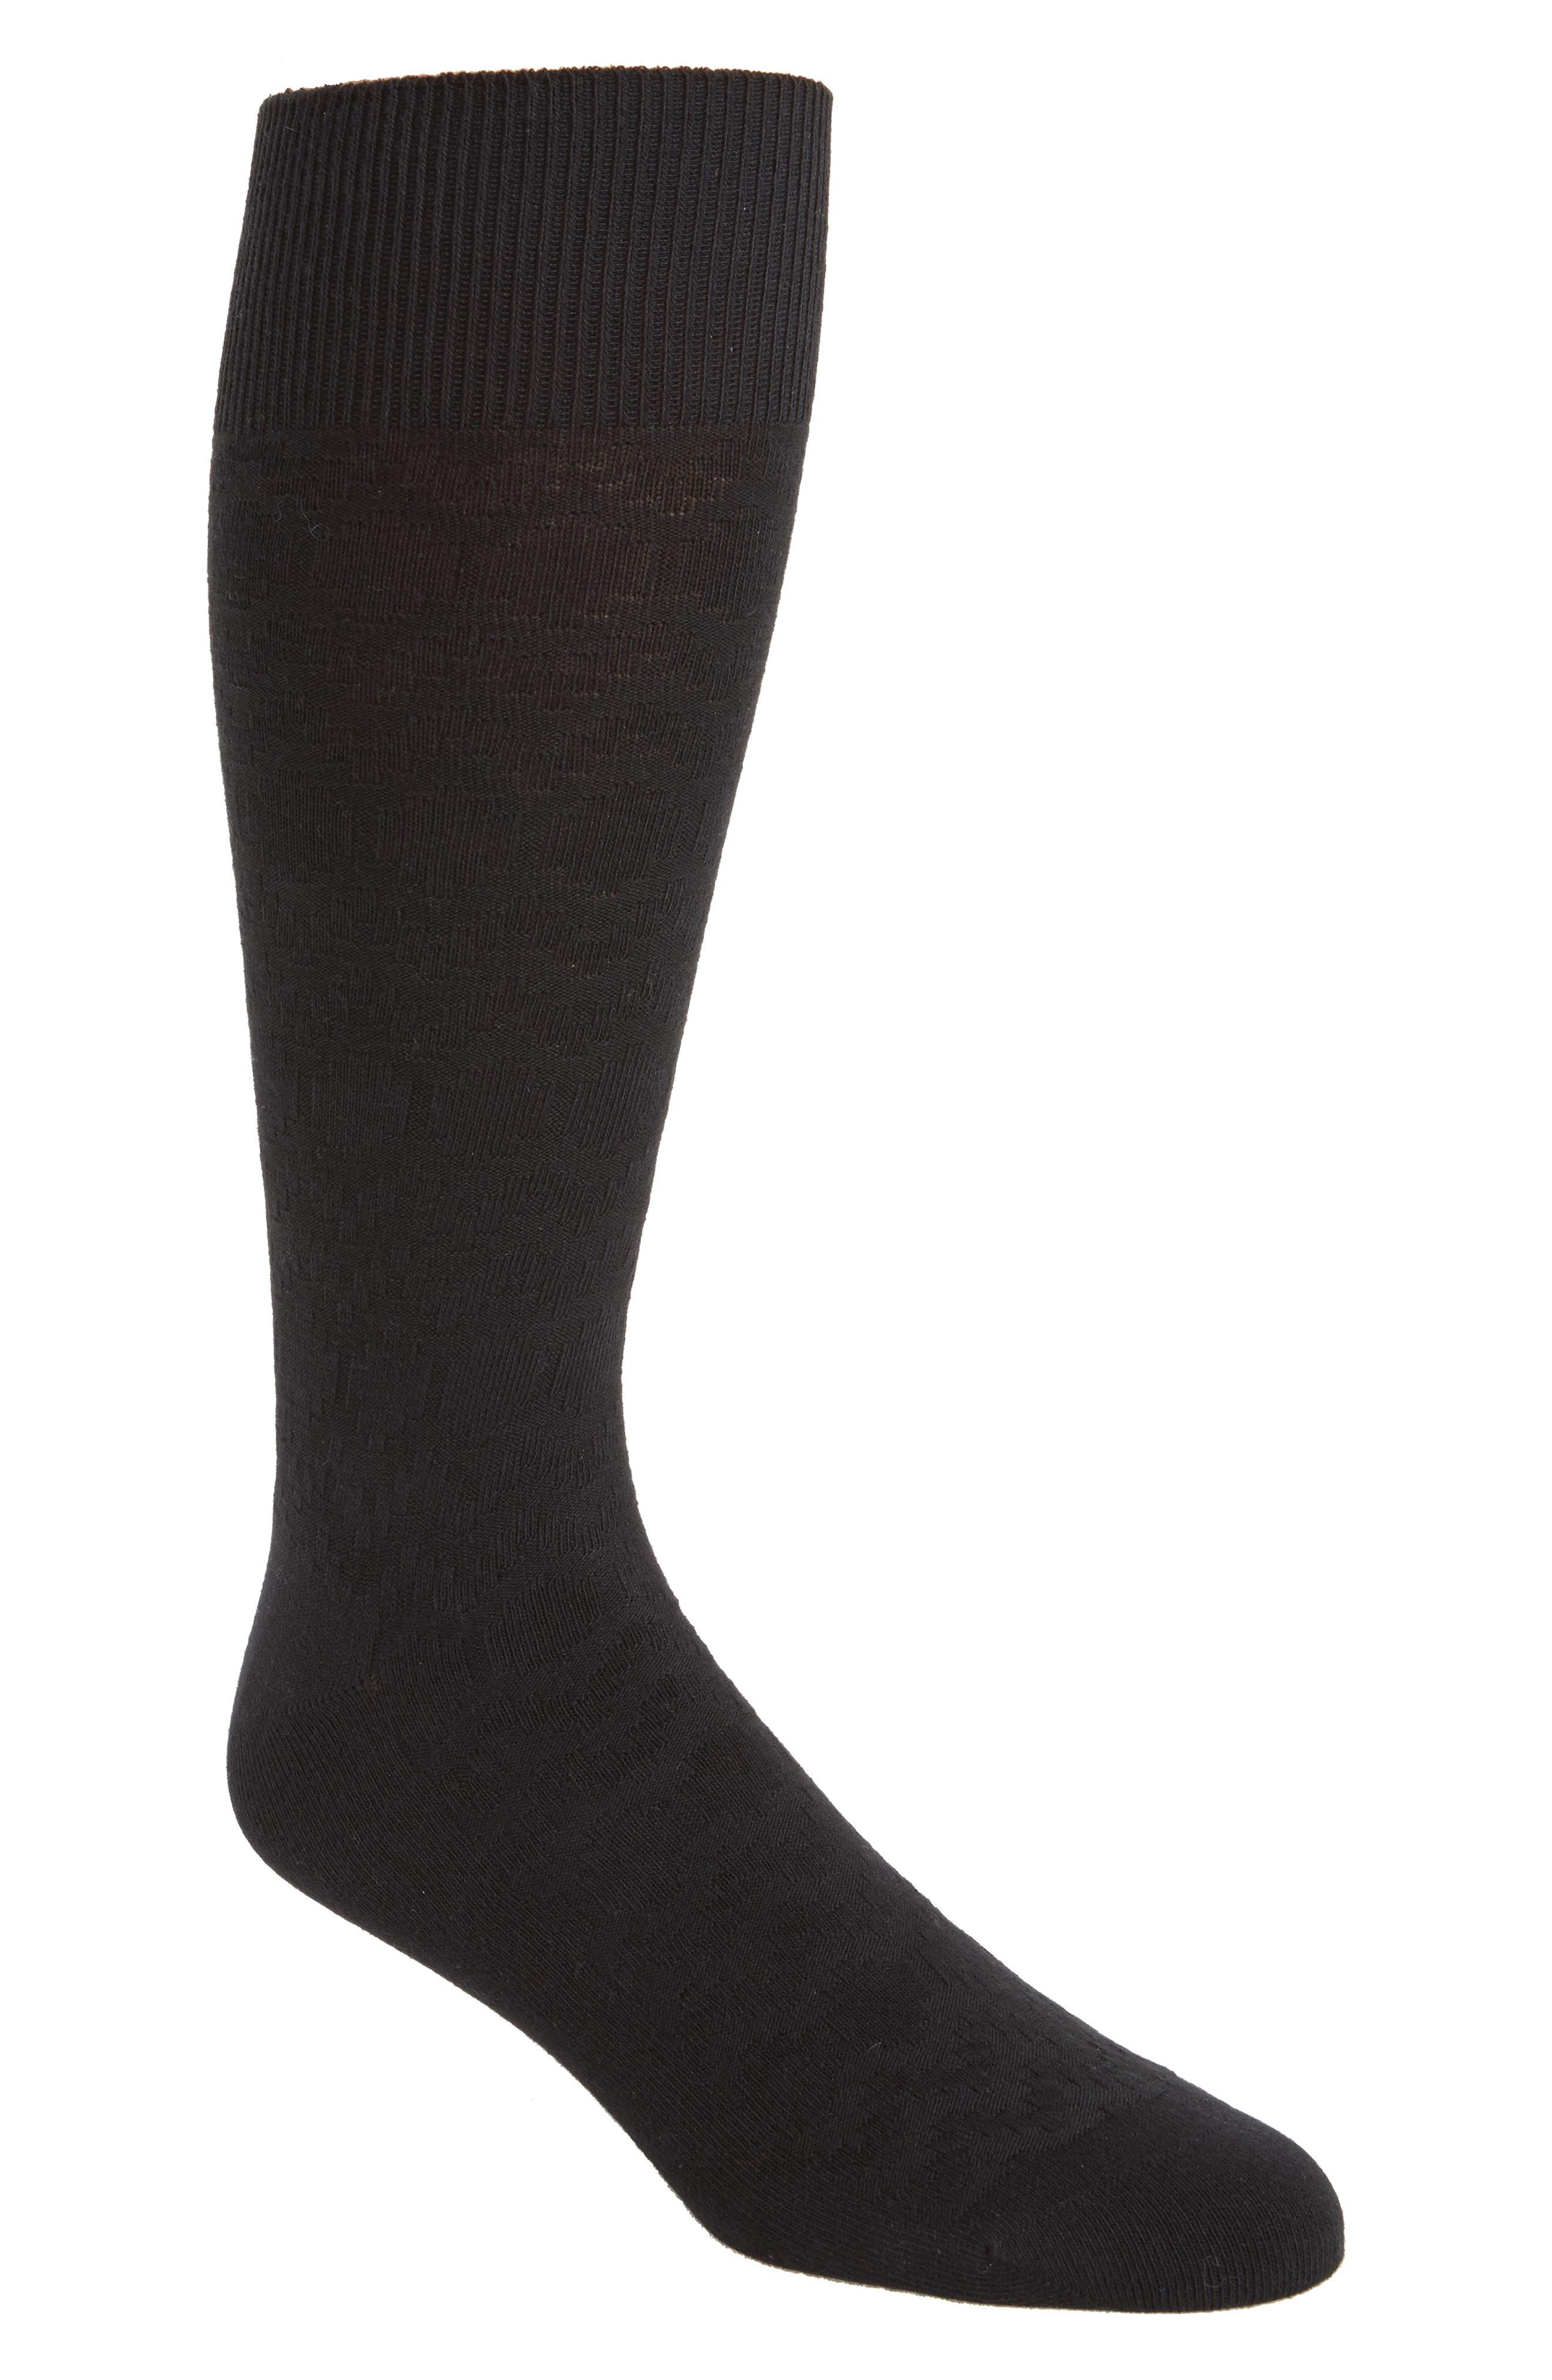 Rug Stripe Texture Socks,                         Main,                         color, 001